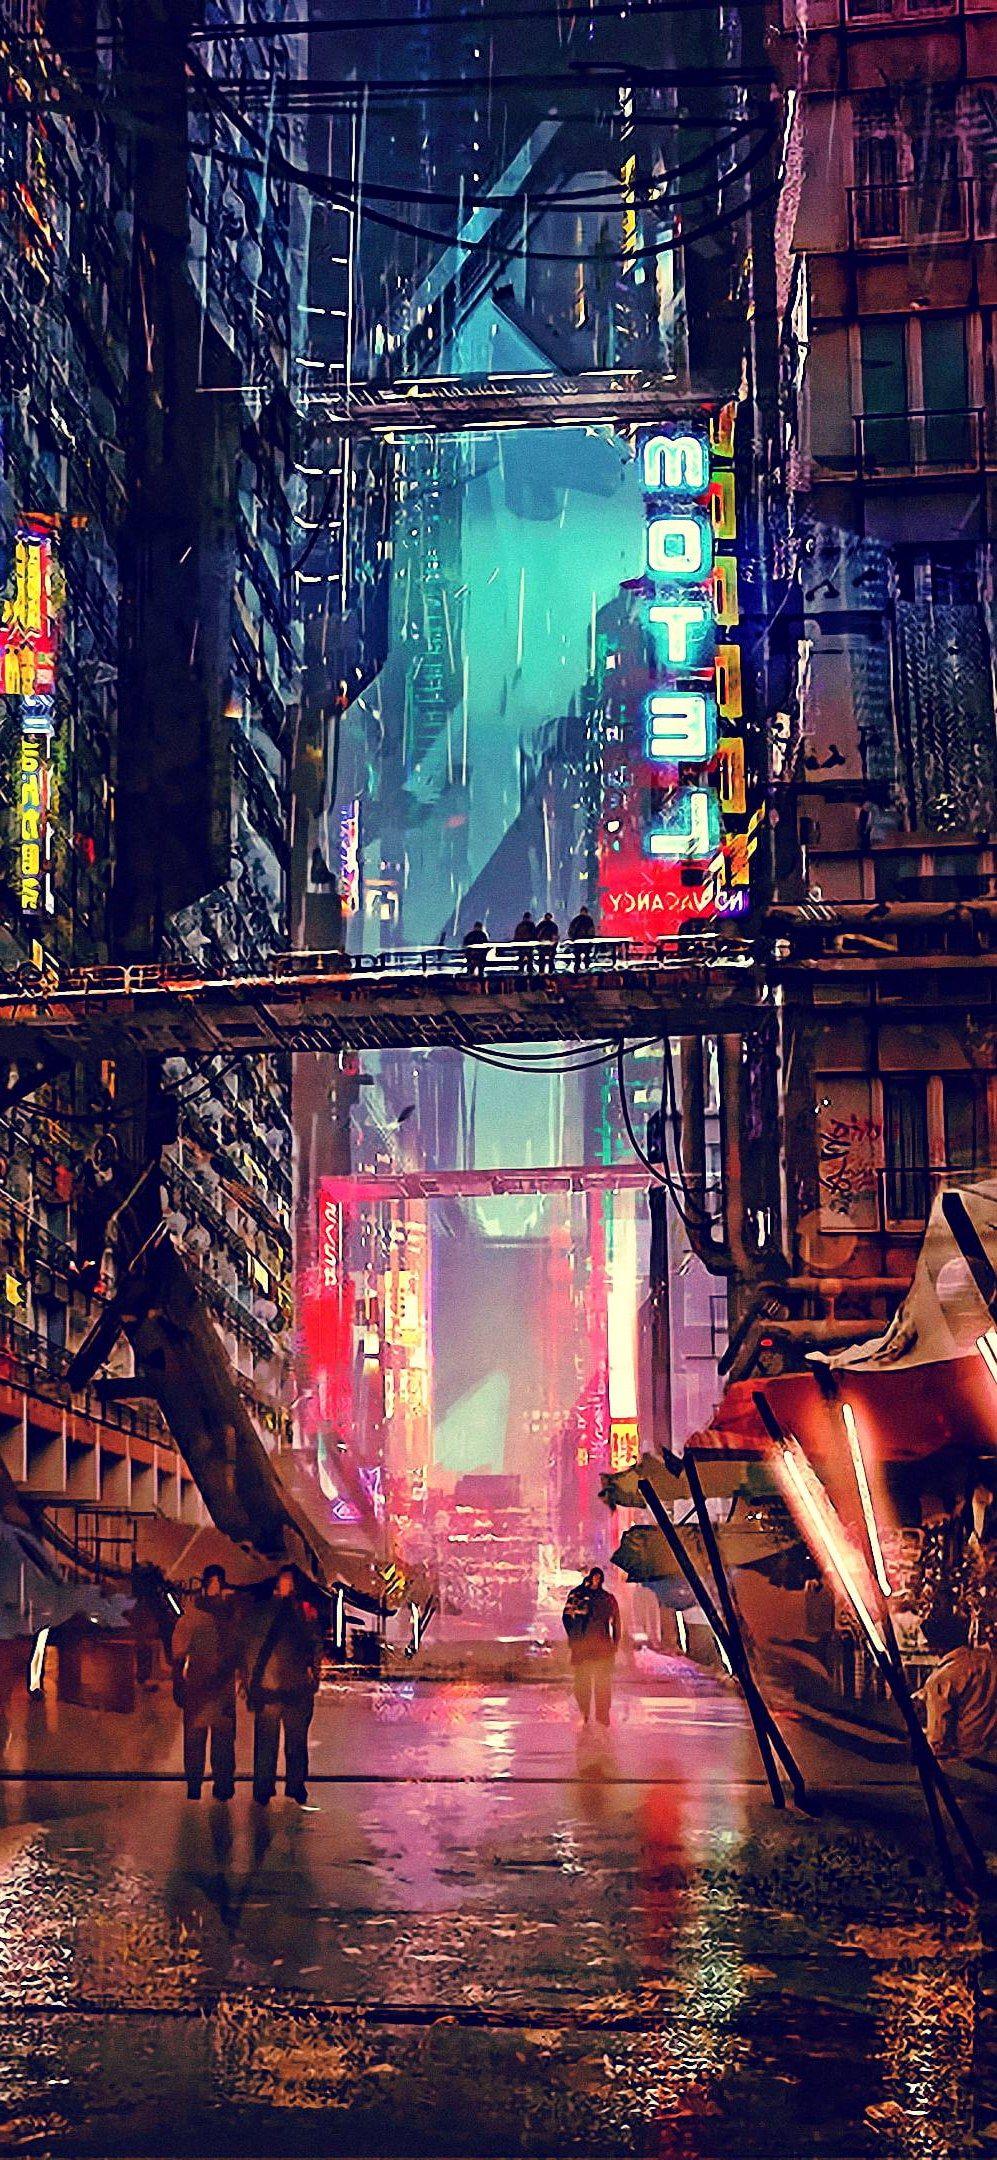 Night Artwork Futuristic City Cyberpunk Wallpaper Iphone X Wallpaper In 2020 Iphone Wallpaper Iphone Wallpaper Images Futuristic City